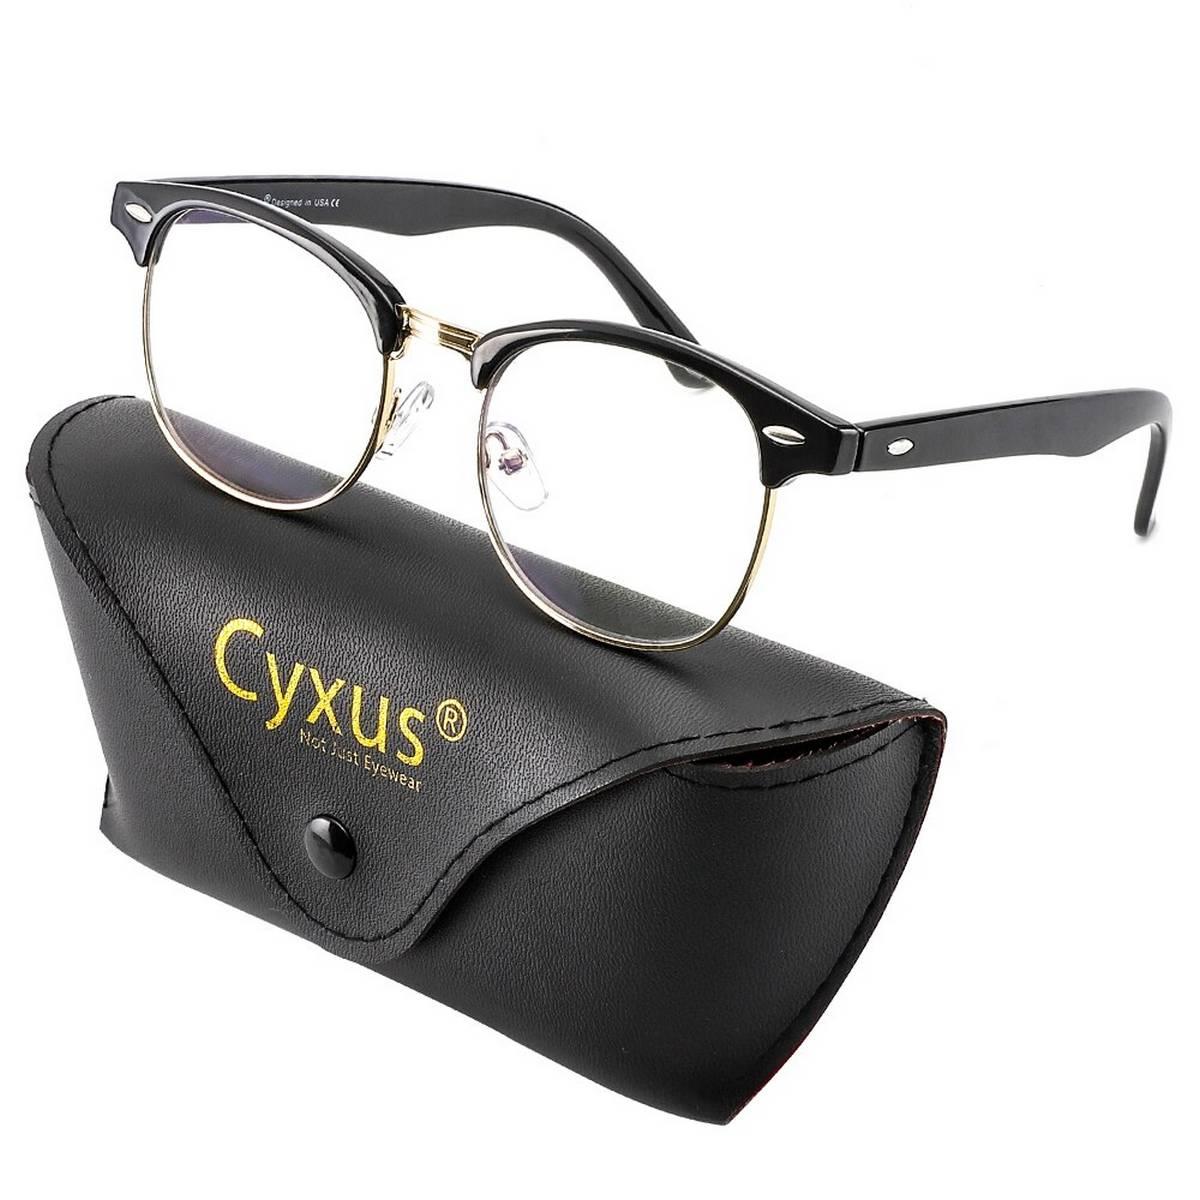 Best Quality New Design Transparent Stylish Glasses with Black Frame For Men/Women